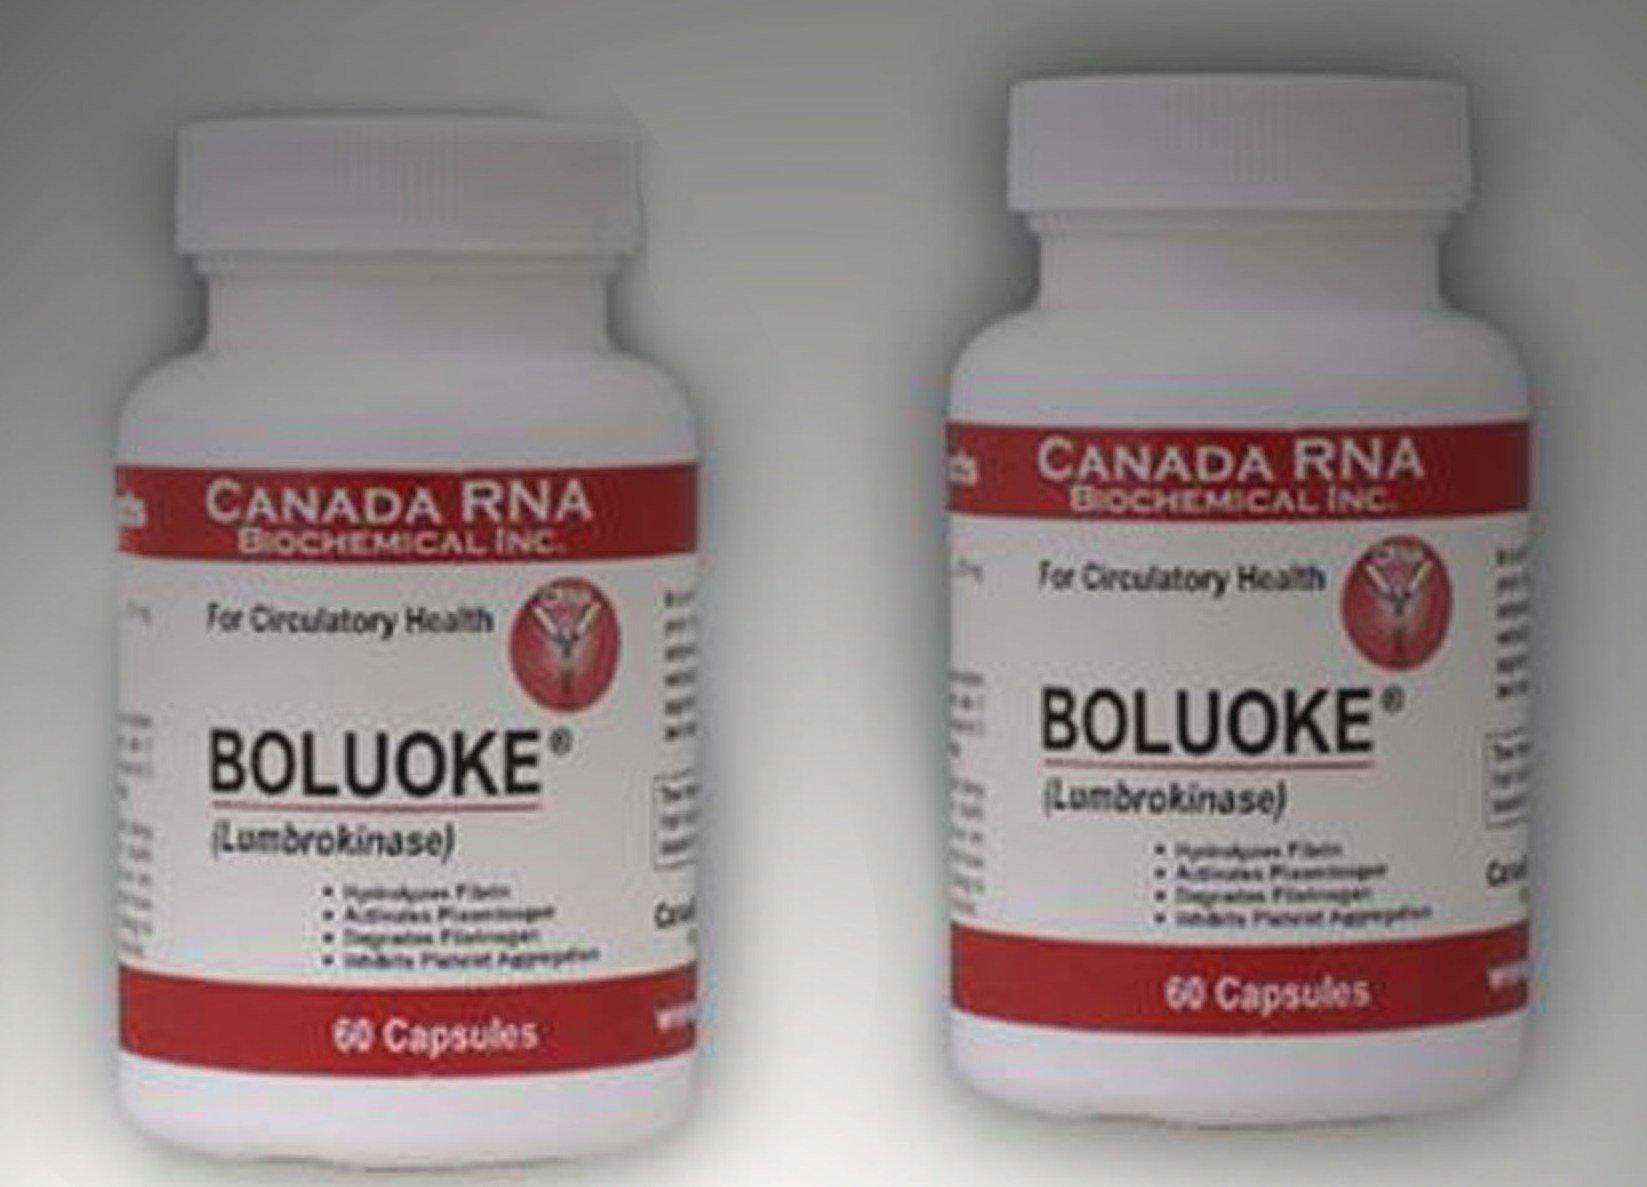 Boluoke (Lumbrokinase) for Circulatory Health Canada RNA, 60